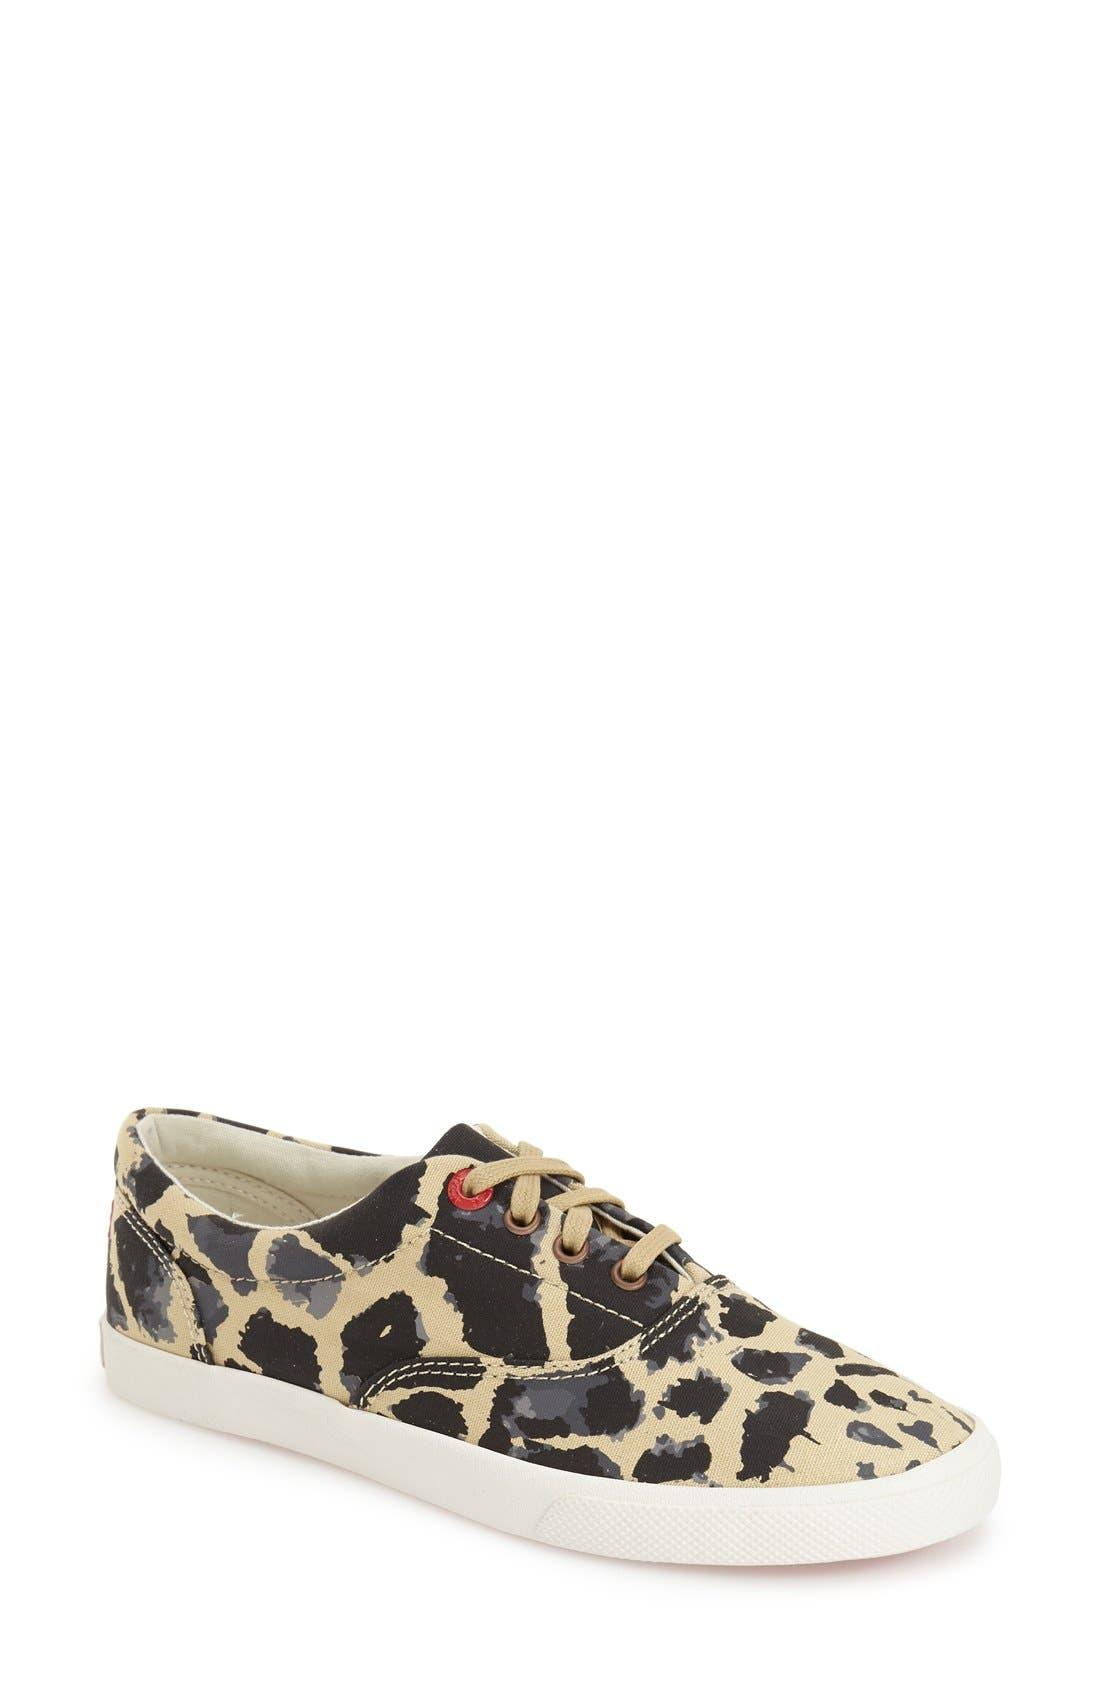 'Giraffe' Sneaker, Main, color, 005